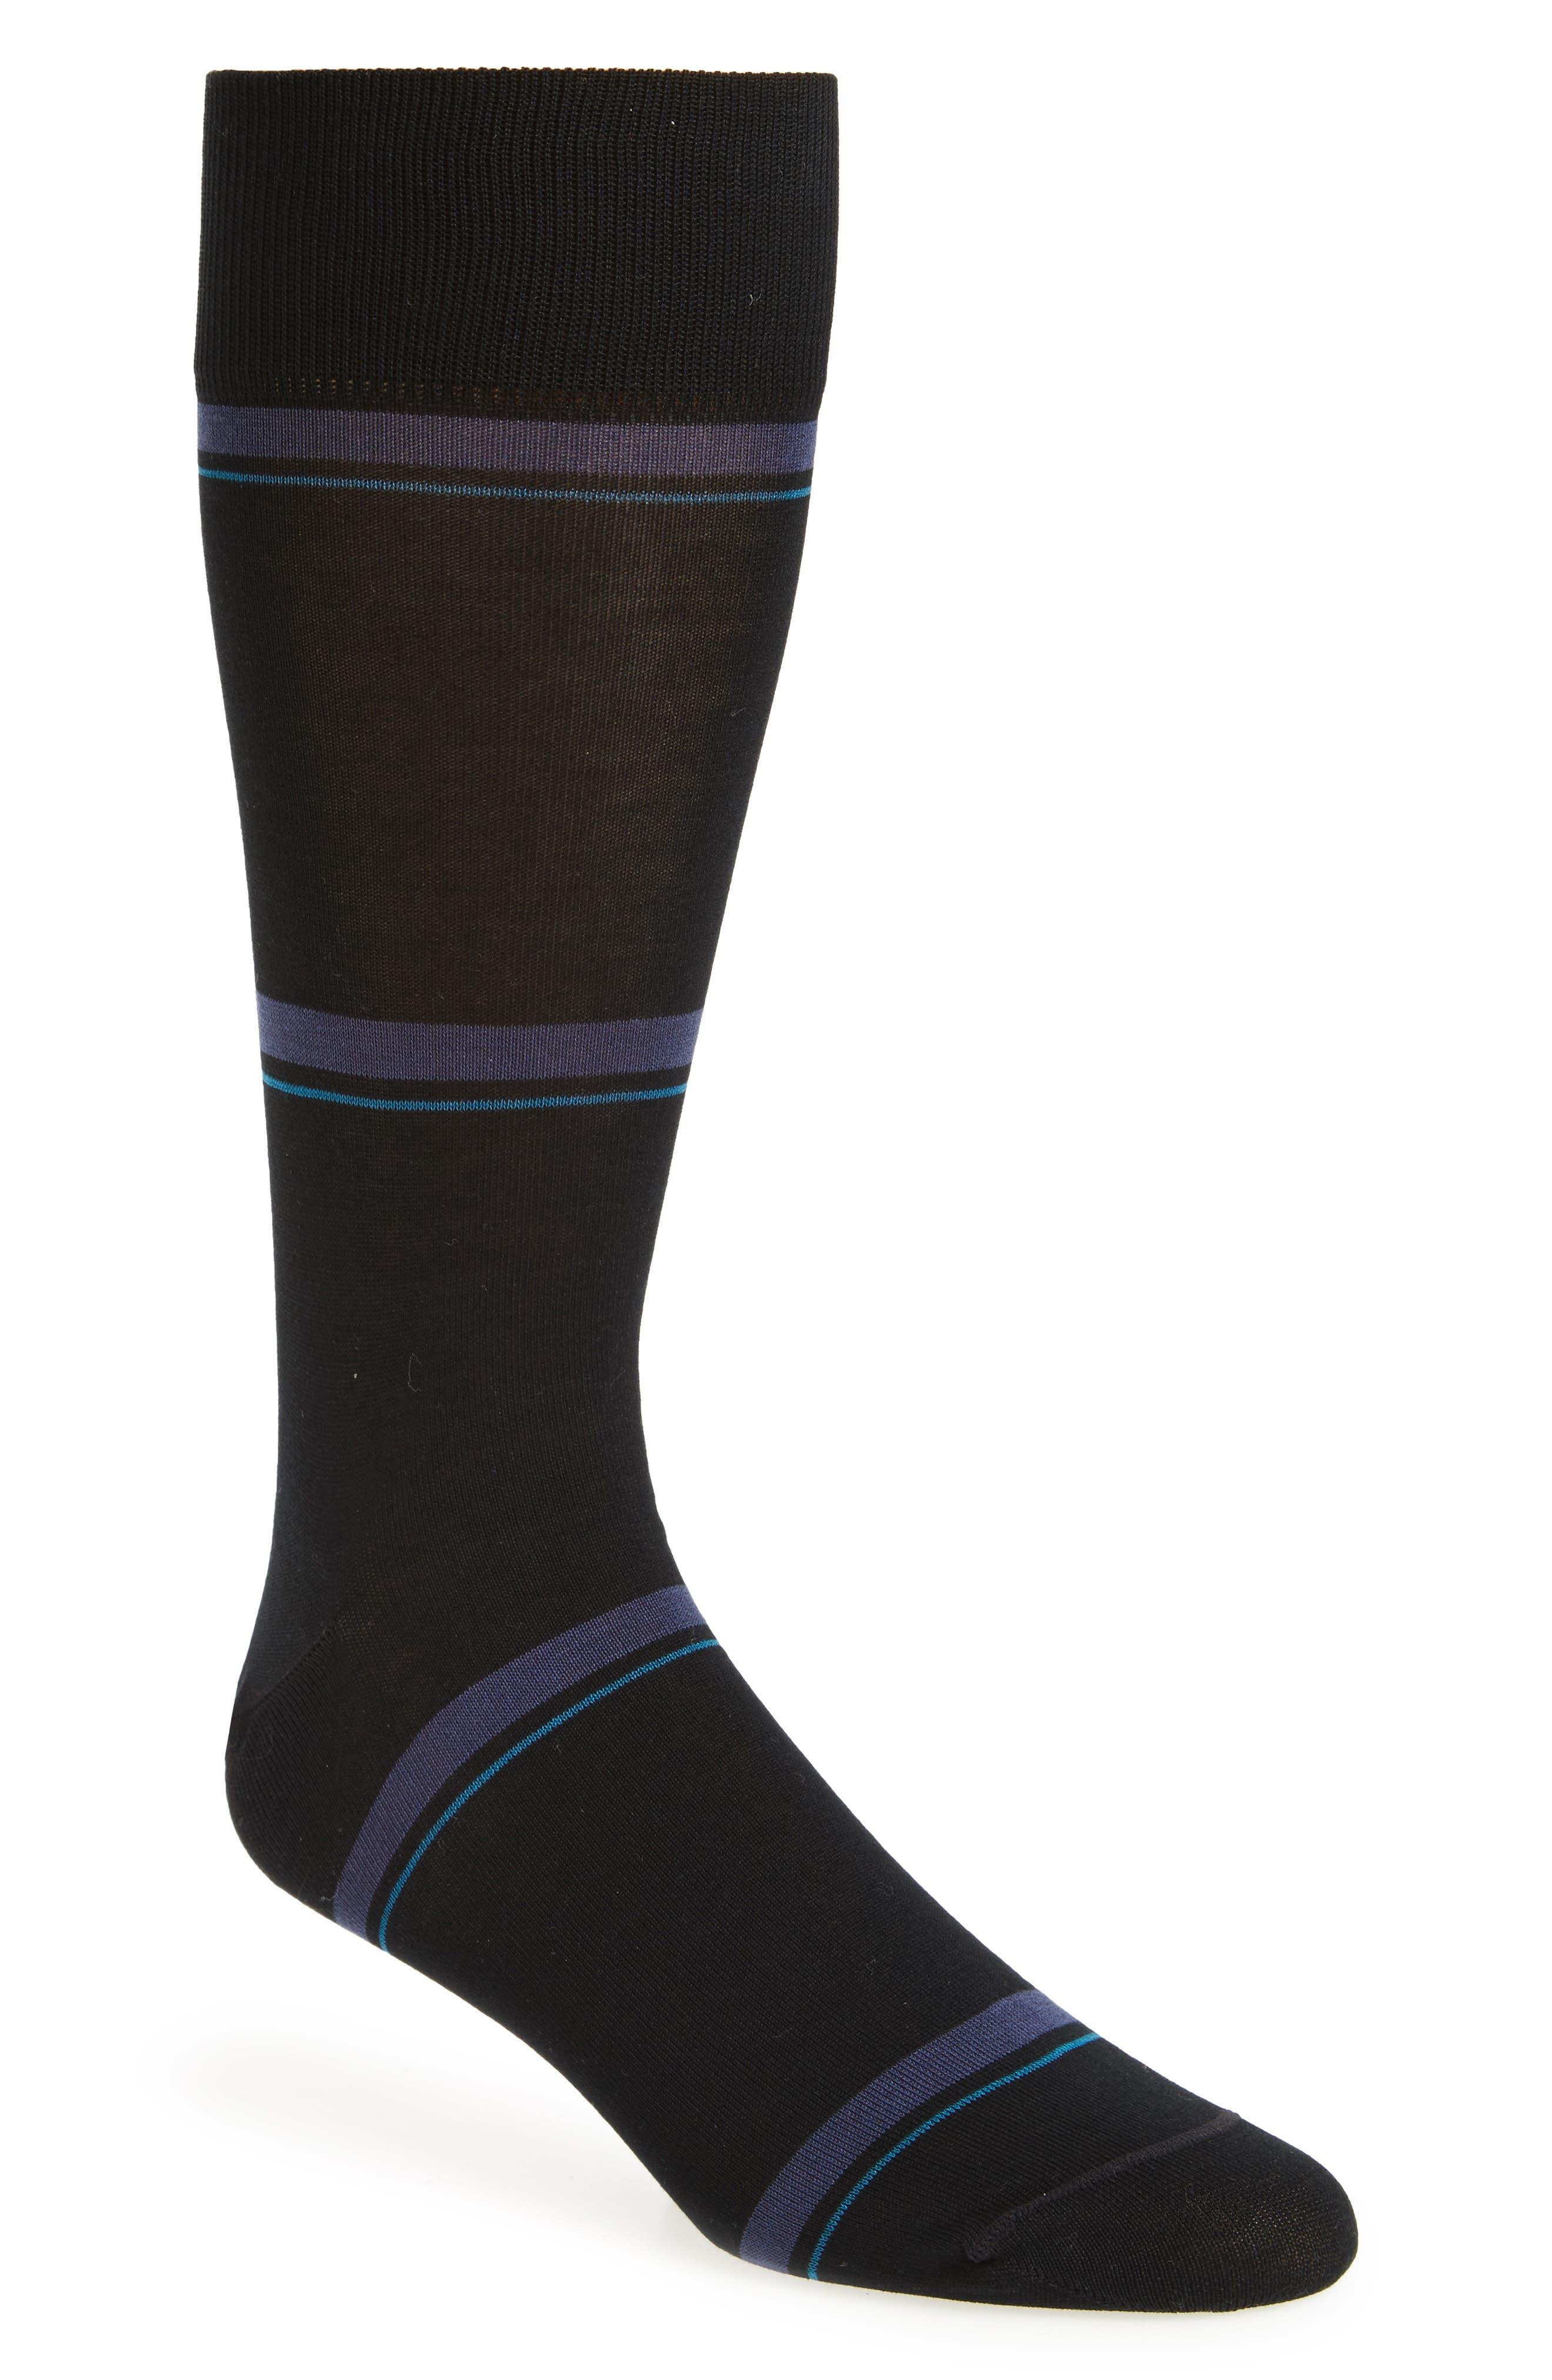 Double Banded Socks,                             Main thumbnail 1, color,                             Black/ Blue